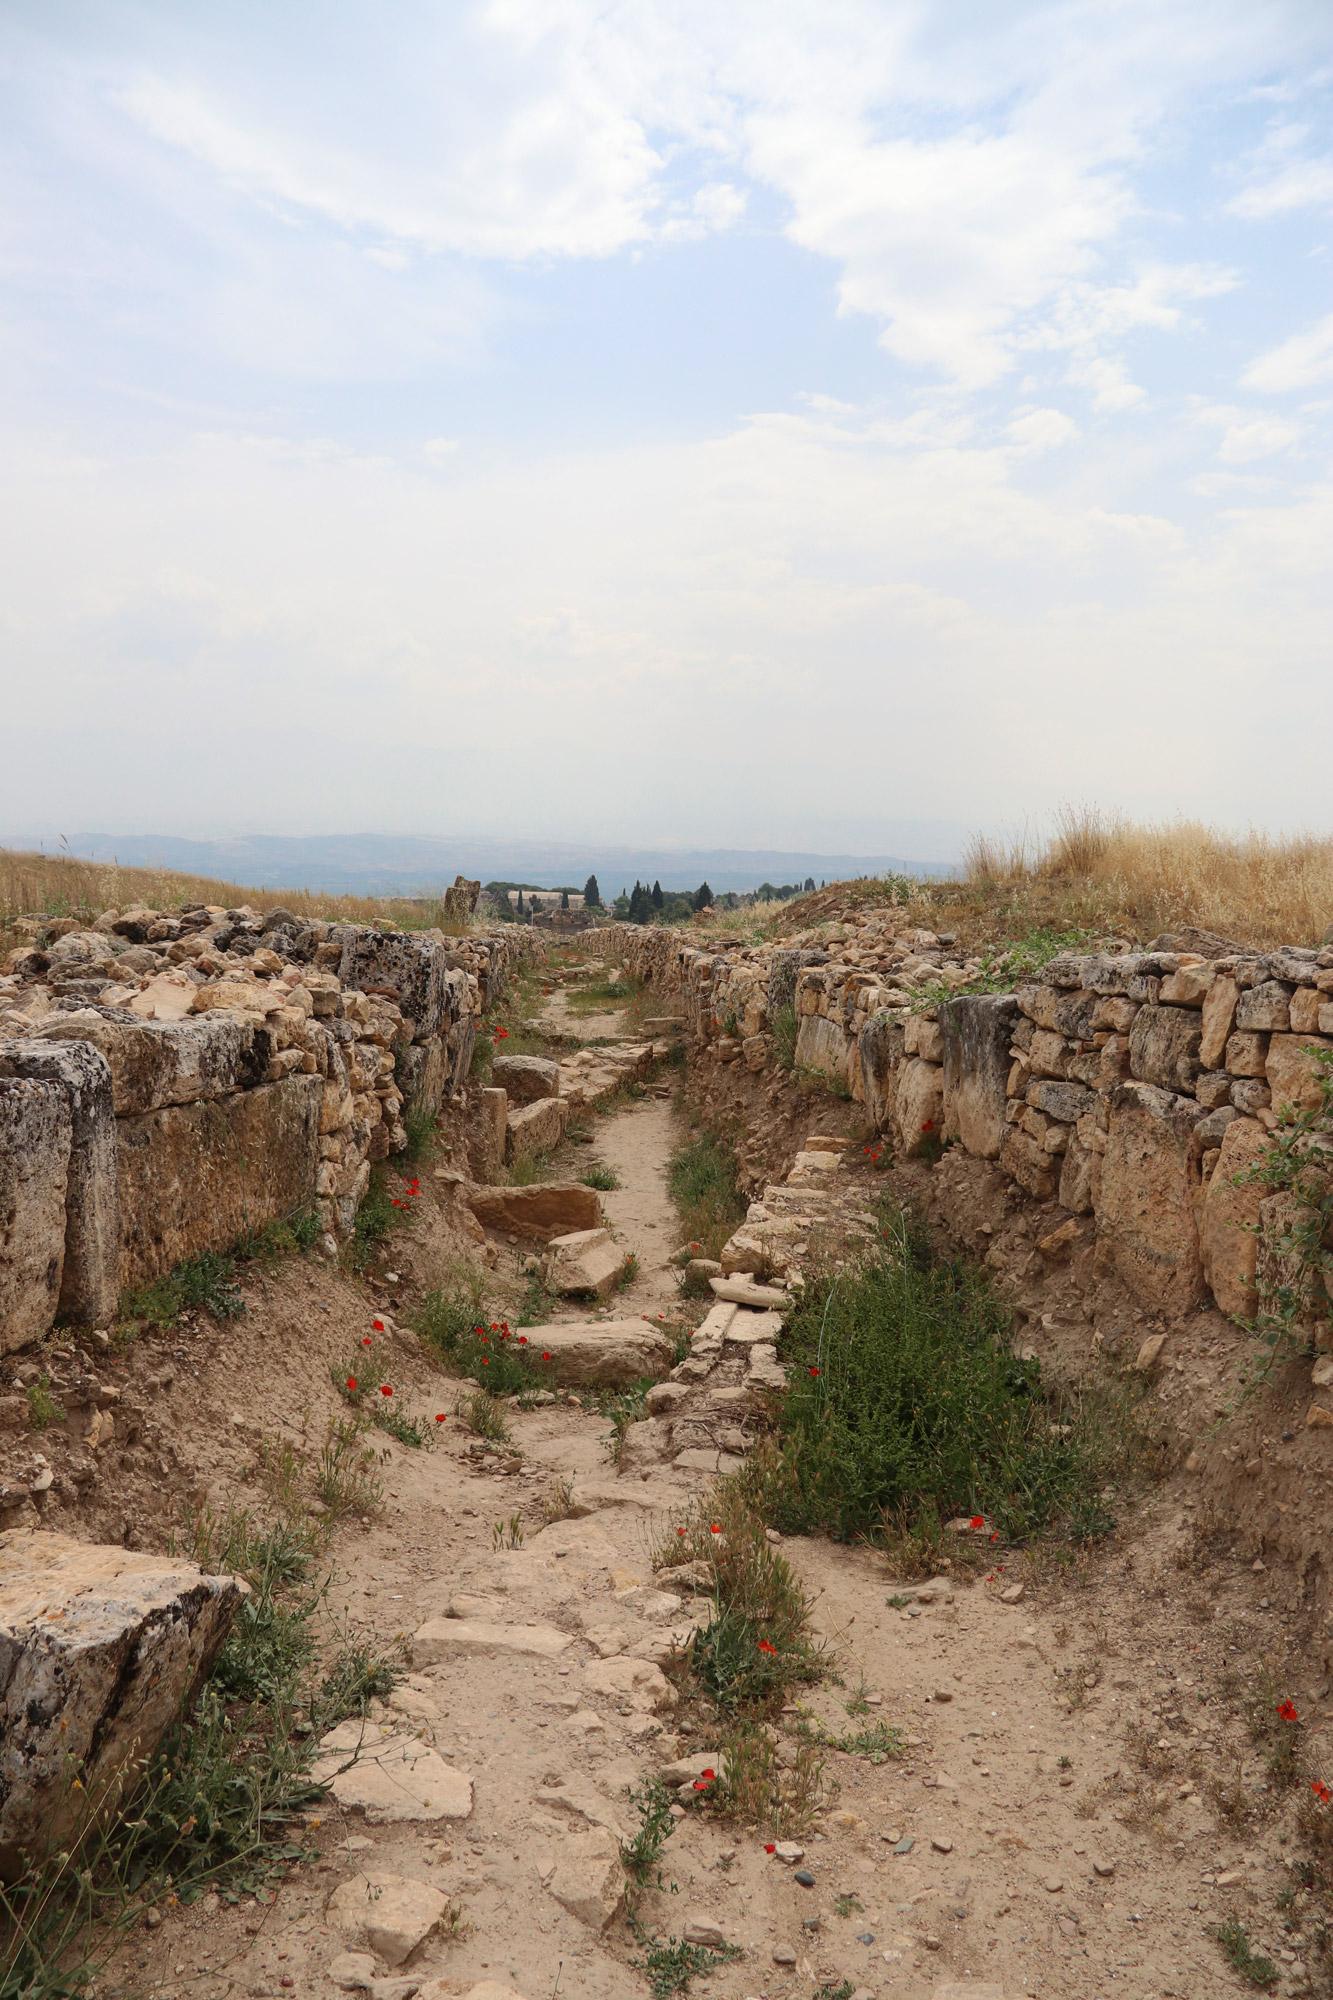 Turkije reisverslag: Pamukkale en Hiërapolis - De wegen van Hiërapolis